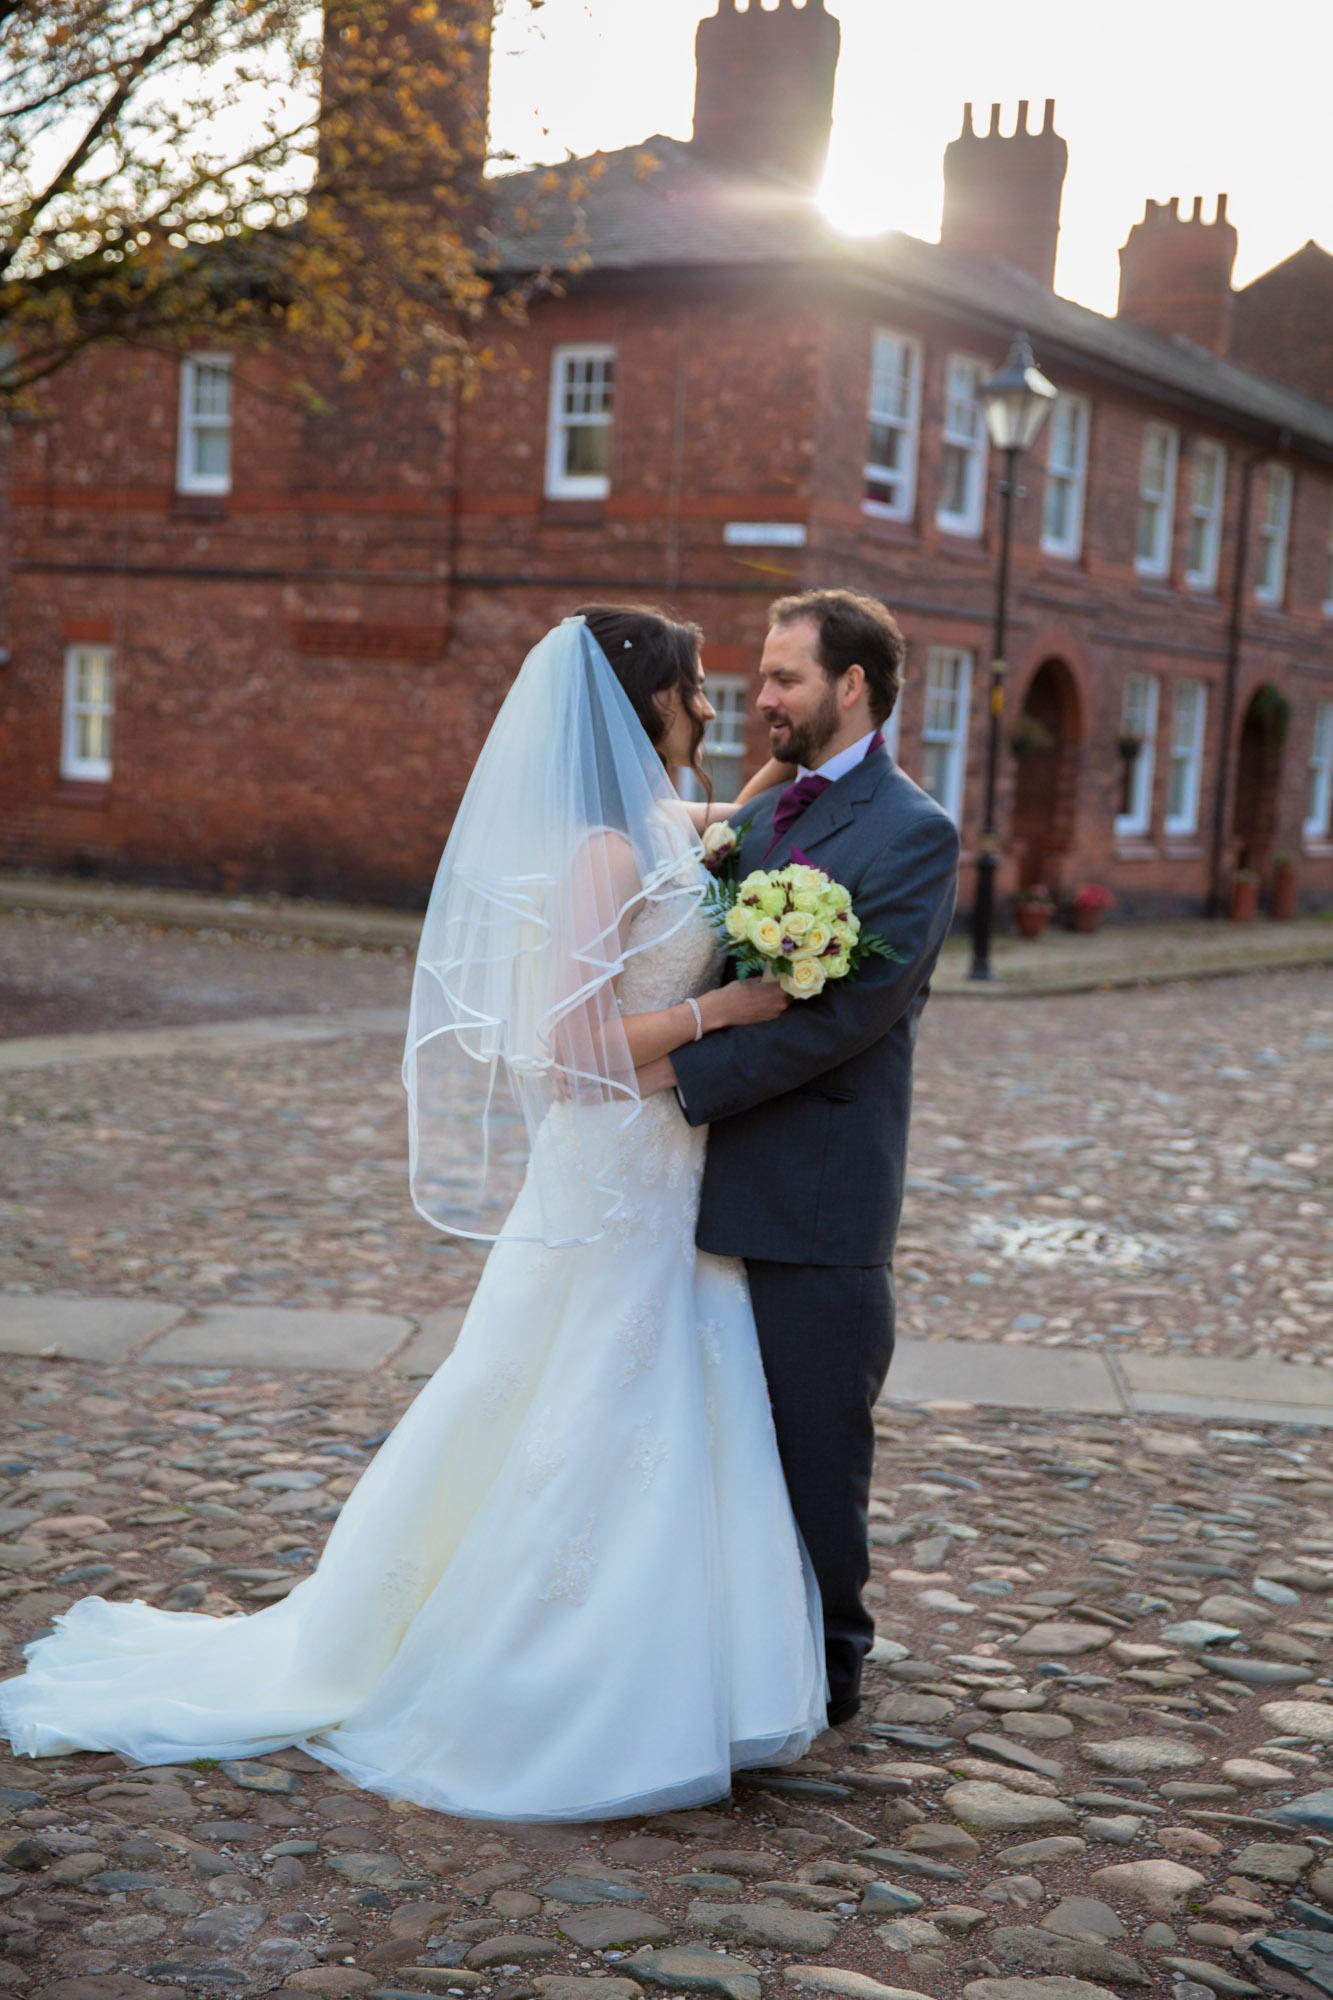 weddings-couples-love-photographer-oxford-london-jonathan-self-photography-71.jpg